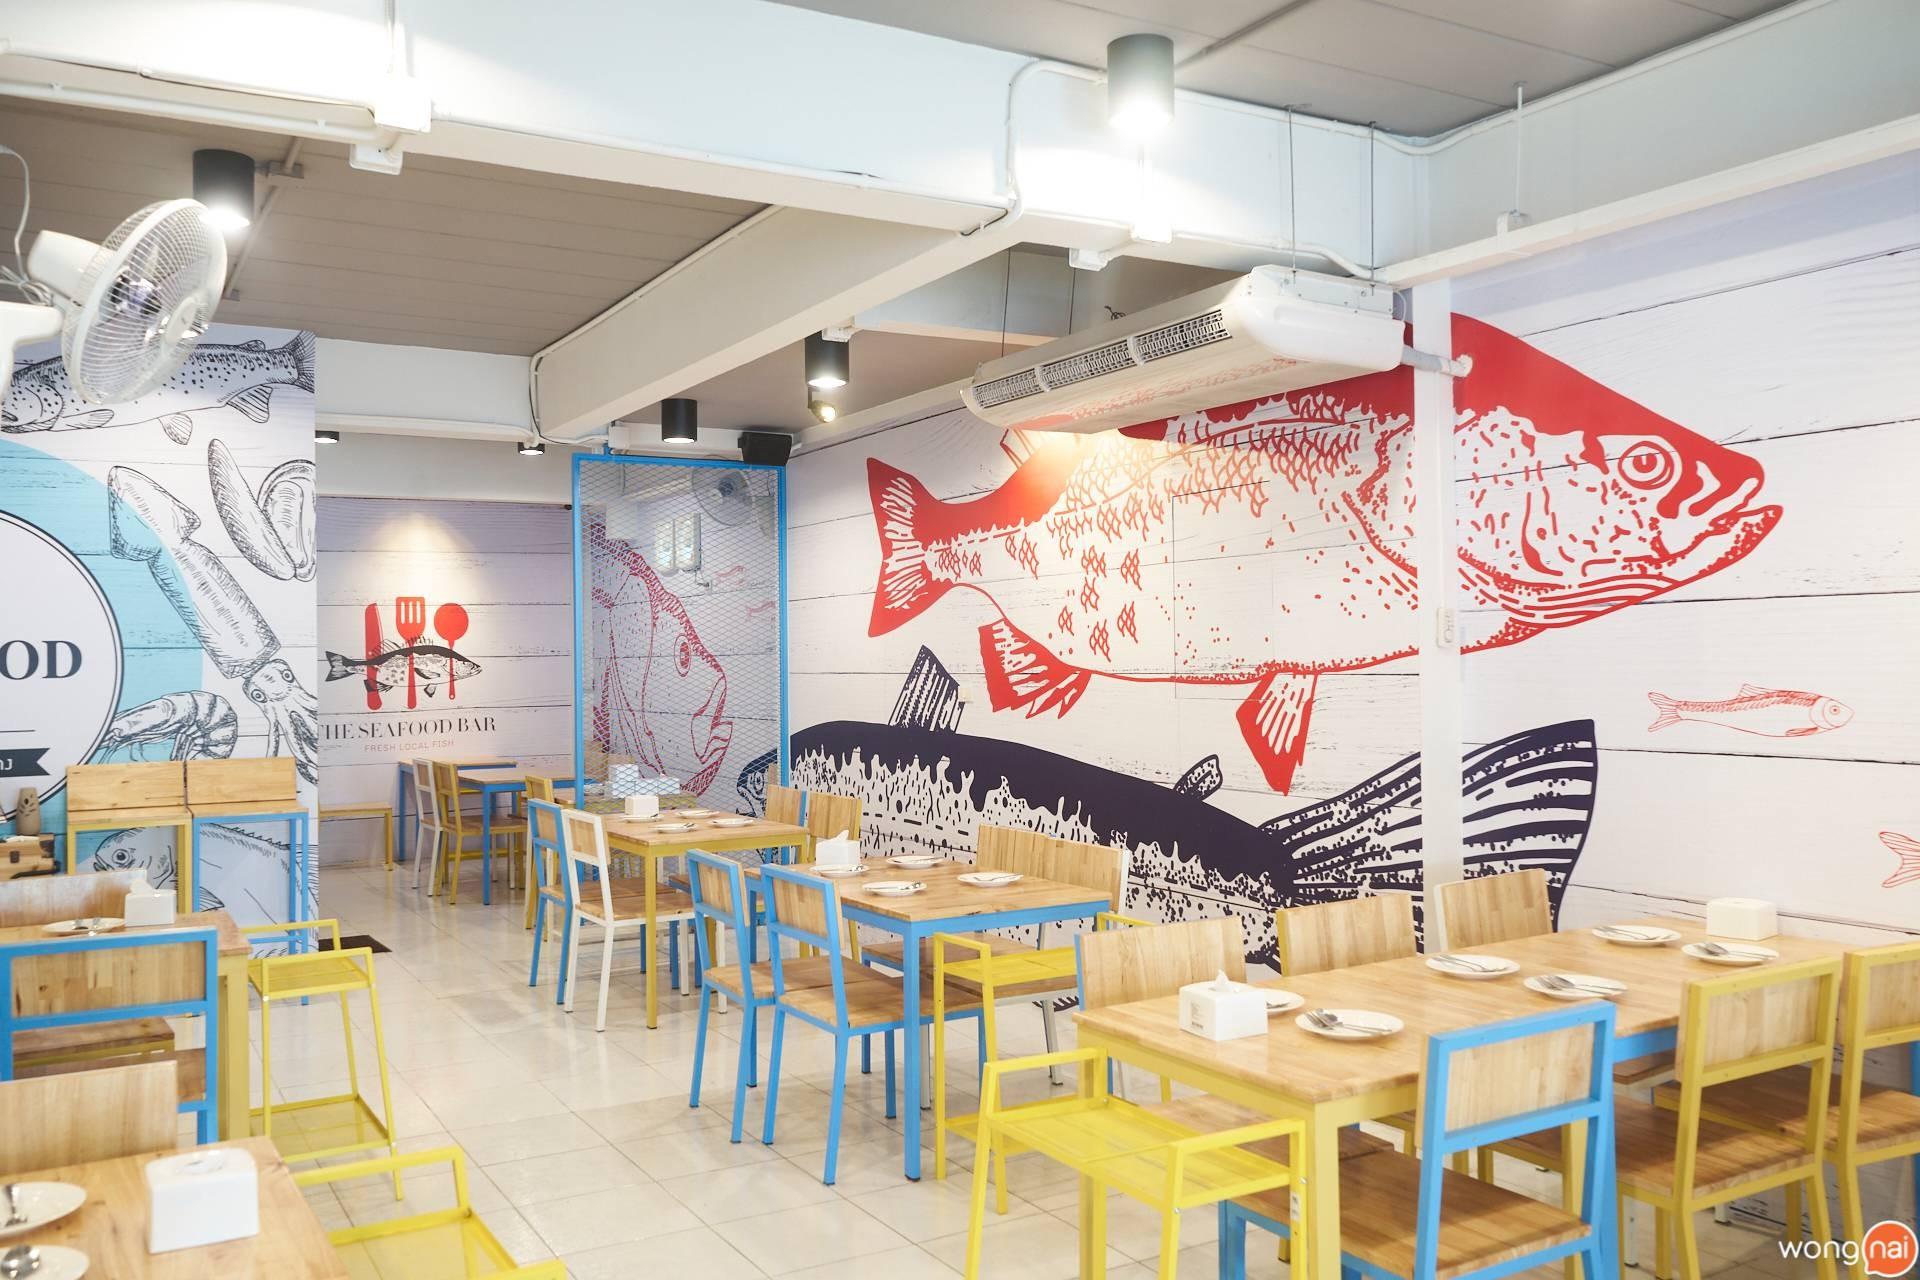 The Seafood Bar by ส้มตำคุณแดง บรรยากาศ